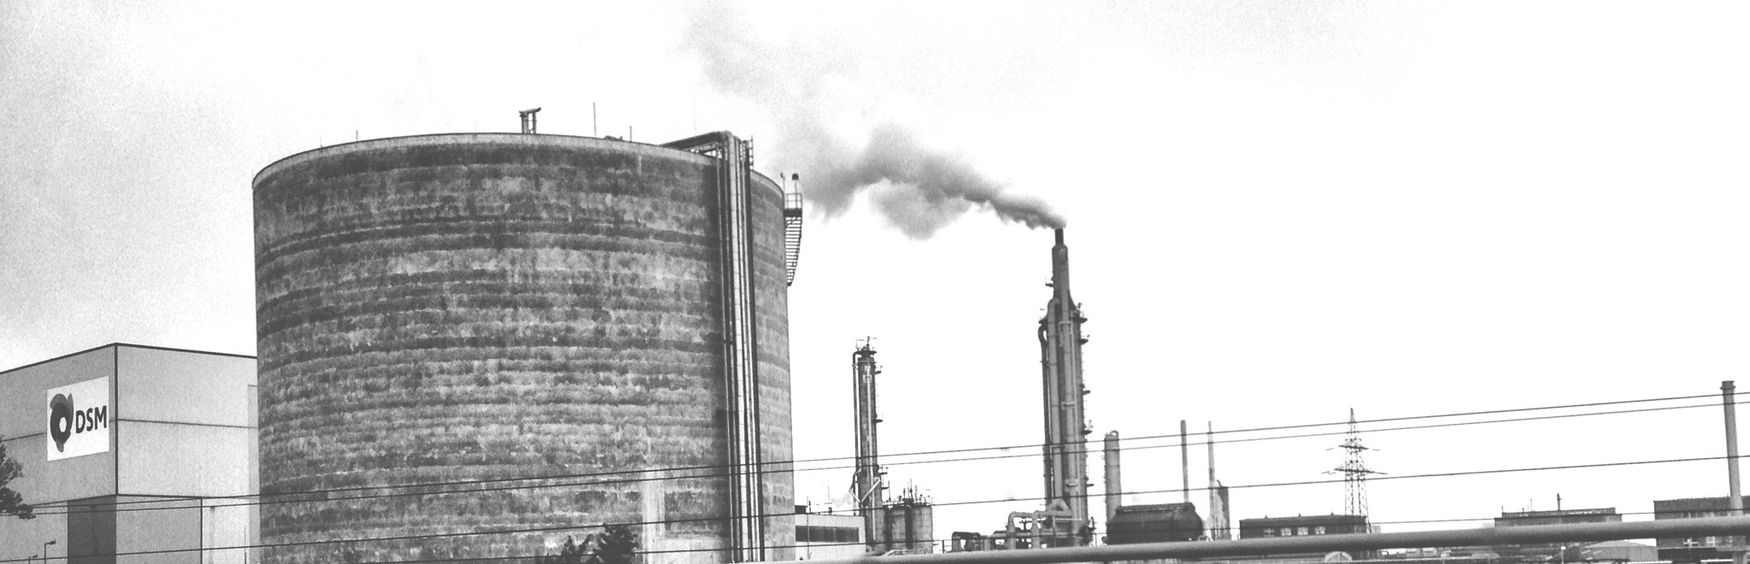 Industrieromantik Streetphotography Blackandwhite Chimney